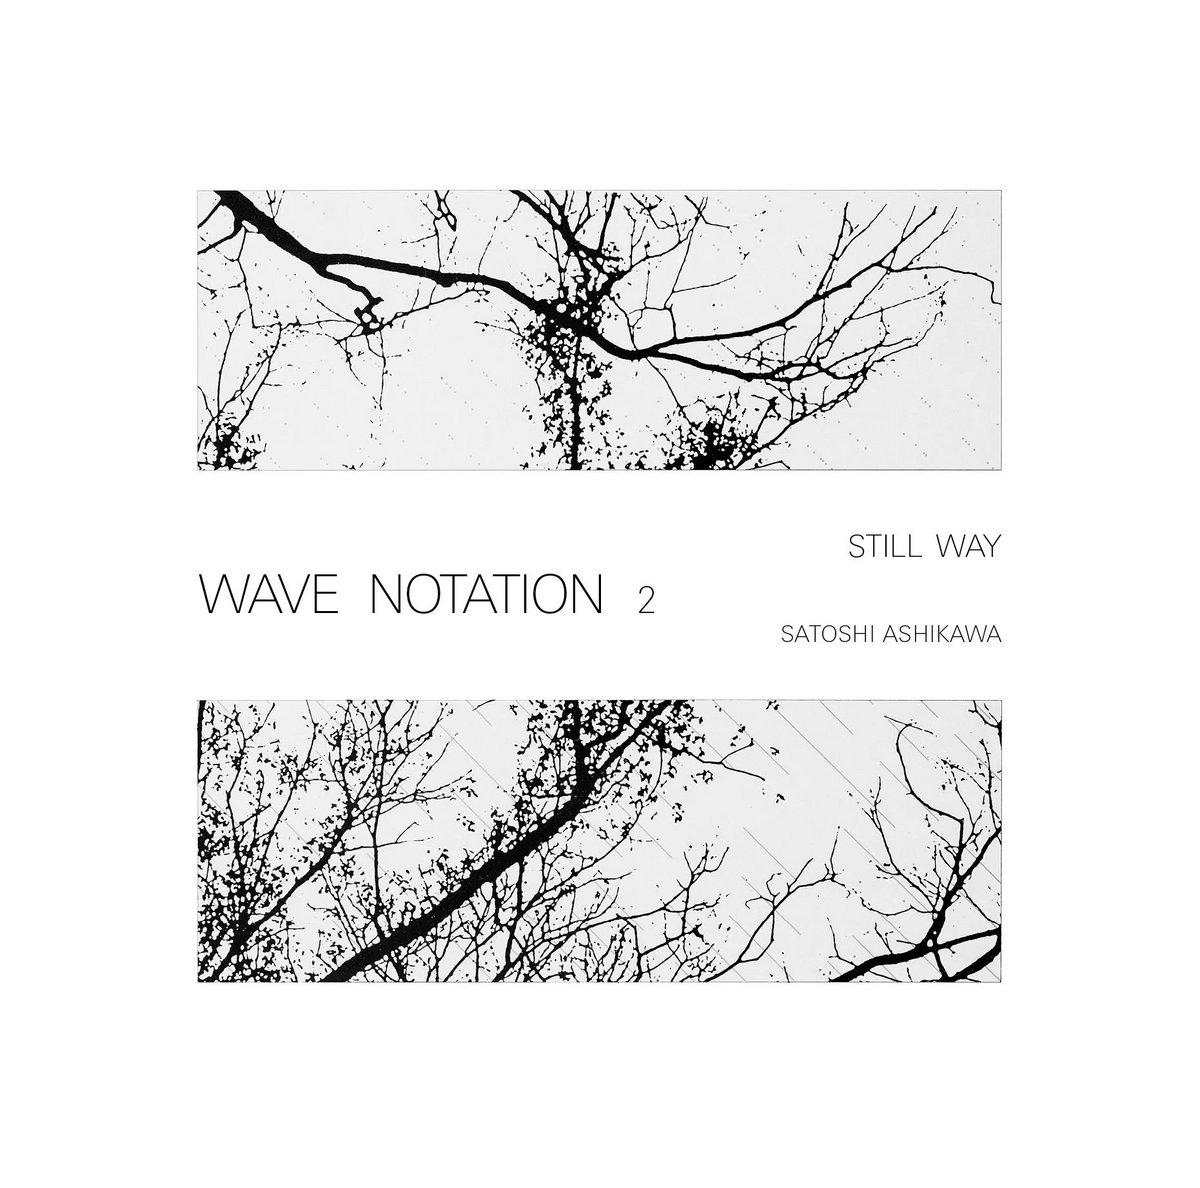 Still Way (Wave Notation 2)   WRWTFWW Records